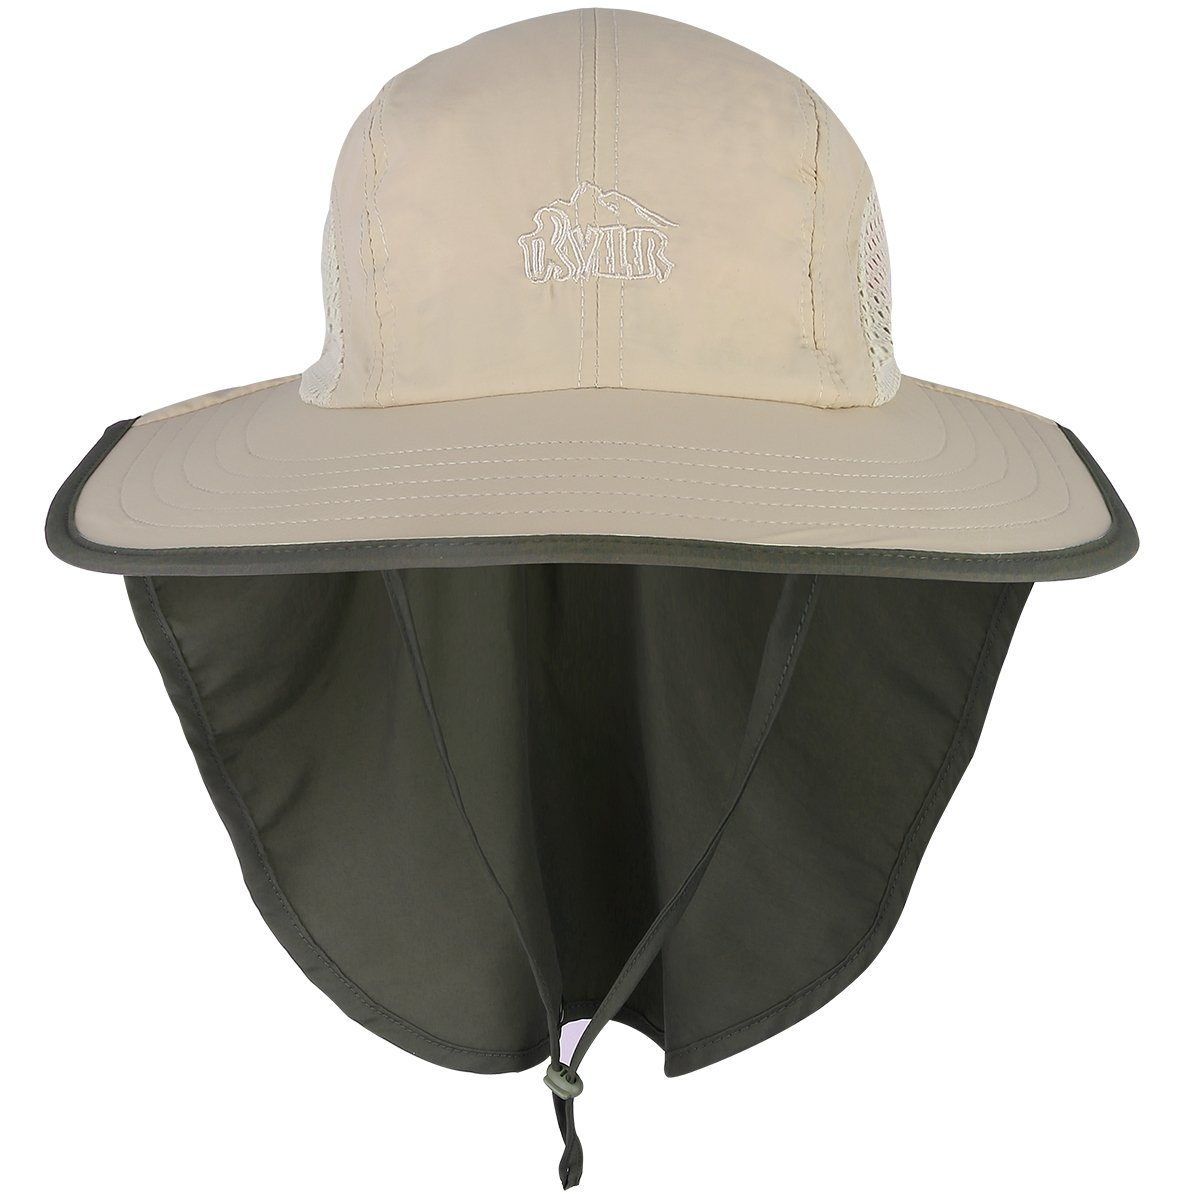 59ce9b44502ca G4Free Sombrero del Sol Gorra al Aire Libre 360°UV UPF 50+ Transpirable  Protege Cuello para la Pesca Senderismo Acampar Caza Diaria Actividades  Unisex  ...